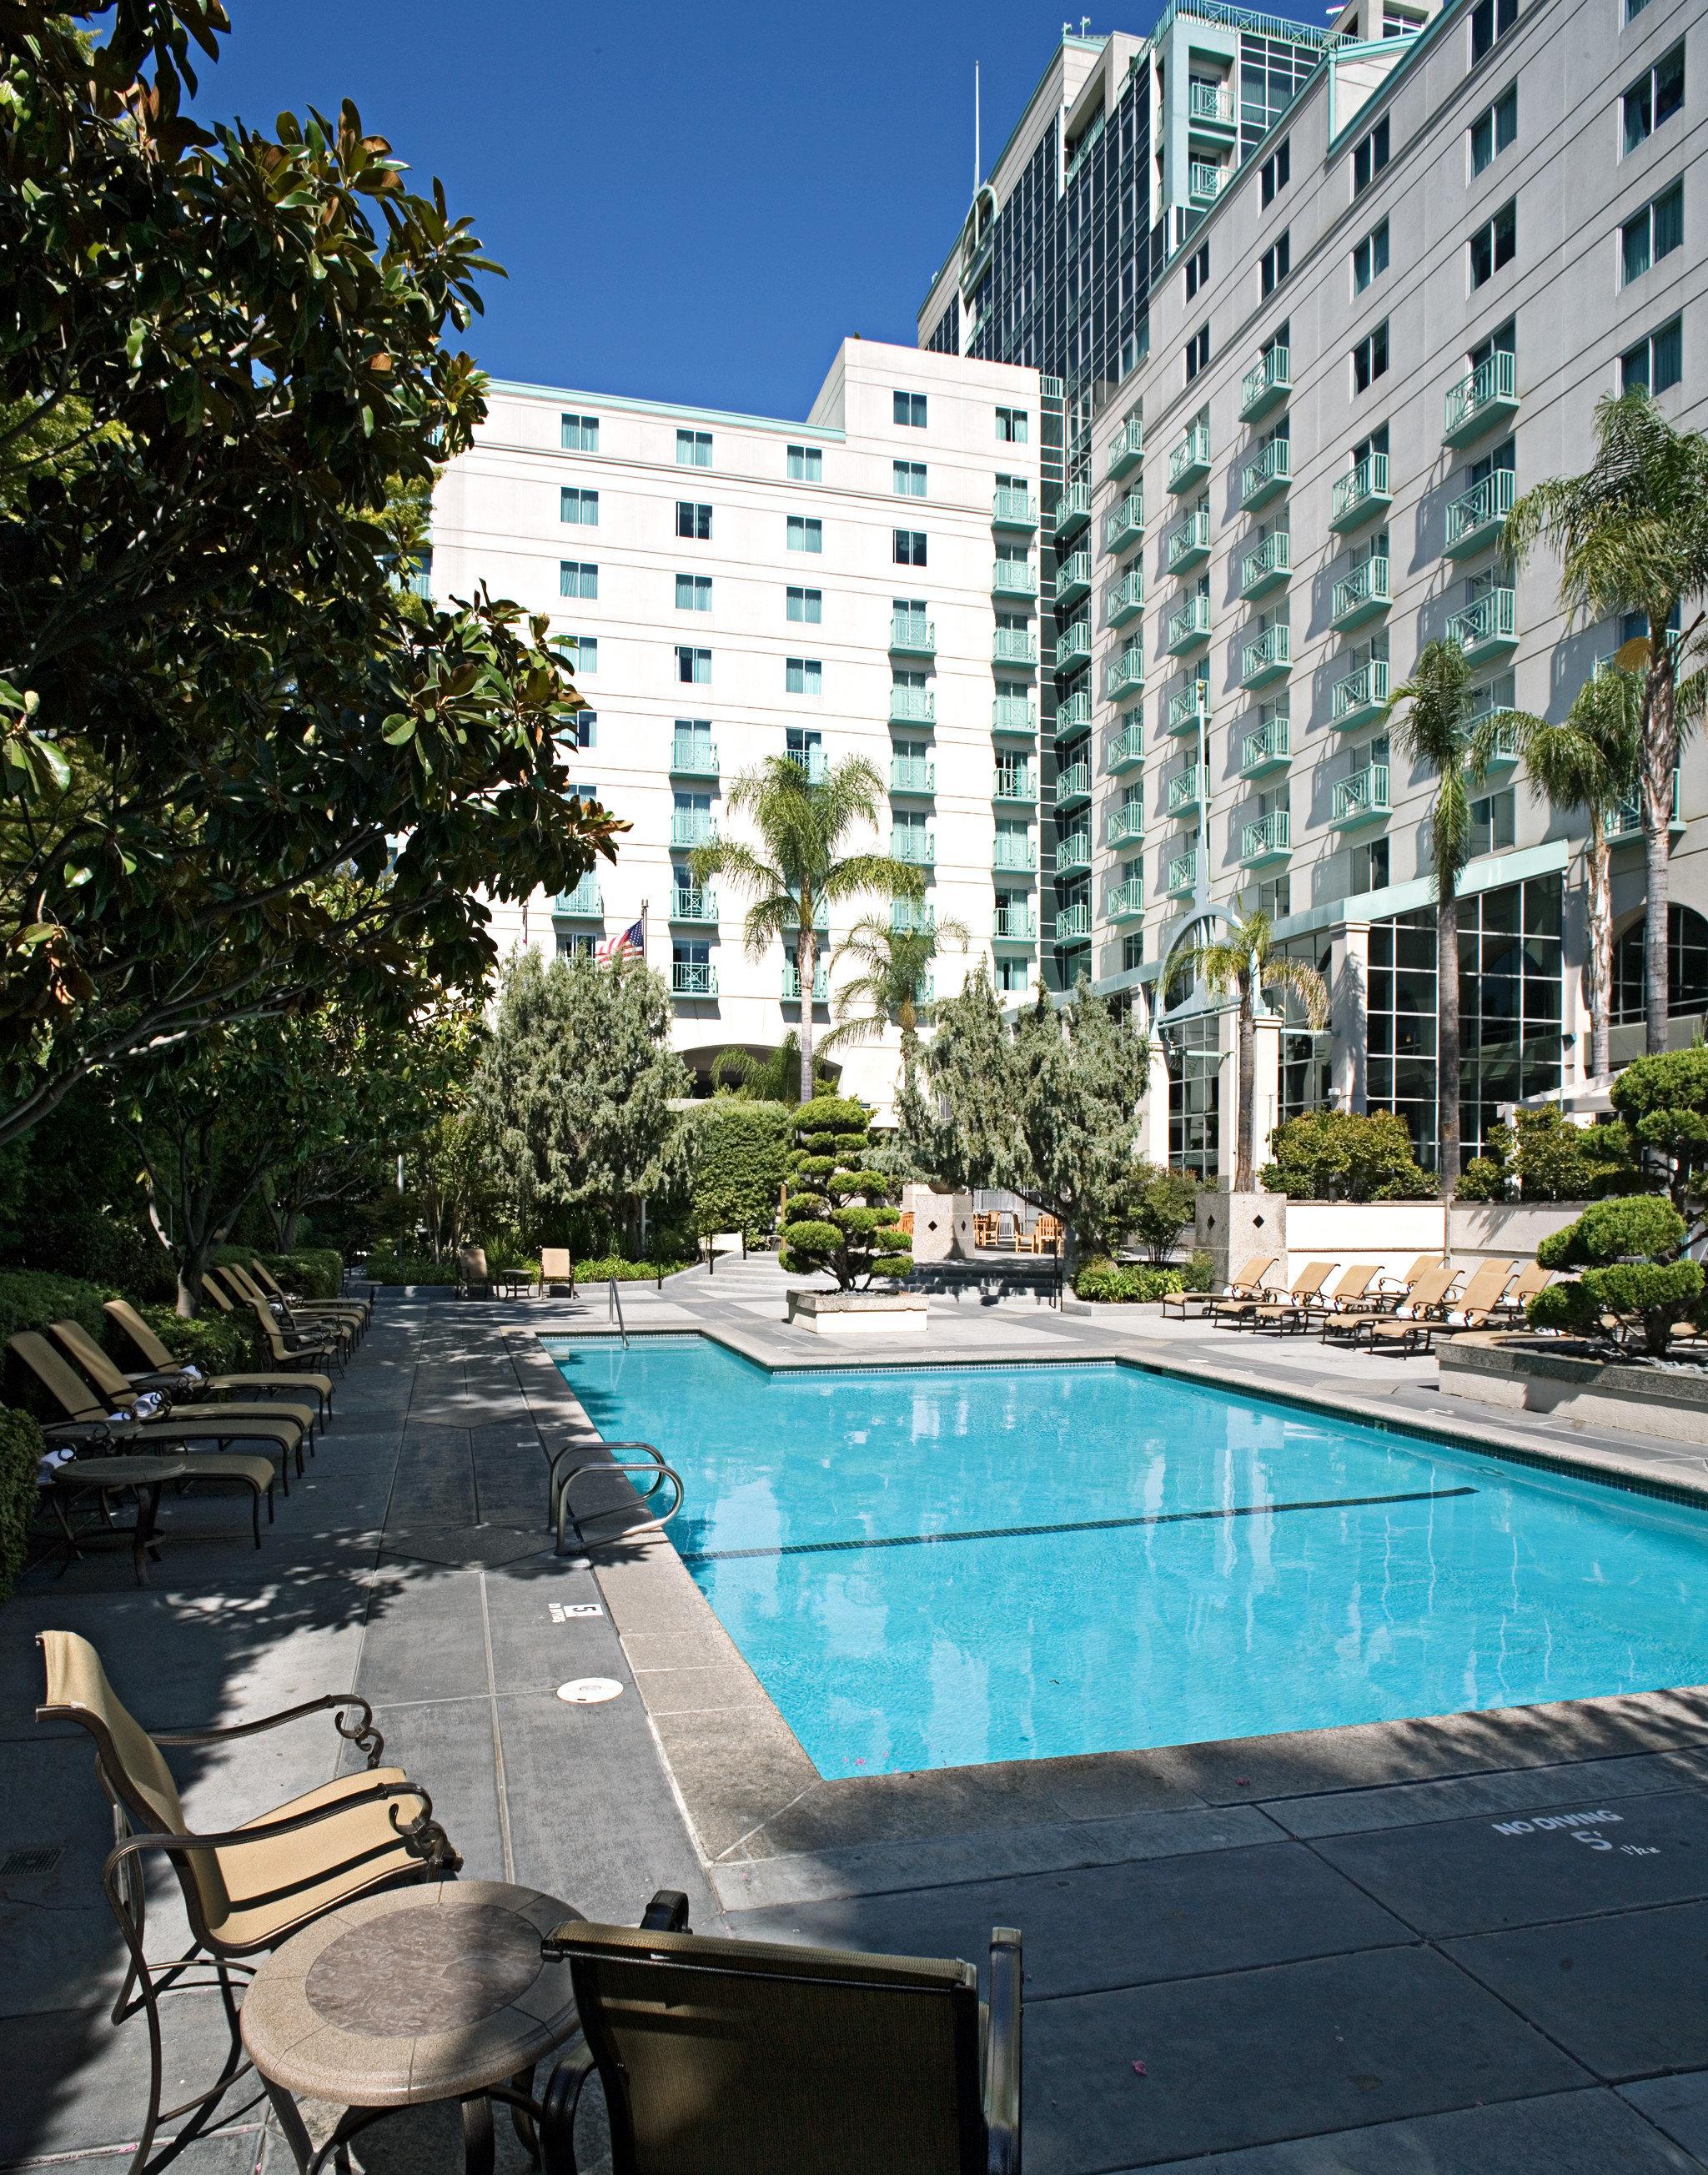 Exterior Lounge Pool tree swimming pool condominium property house park home residential area backyard Courtyard City Resort stone